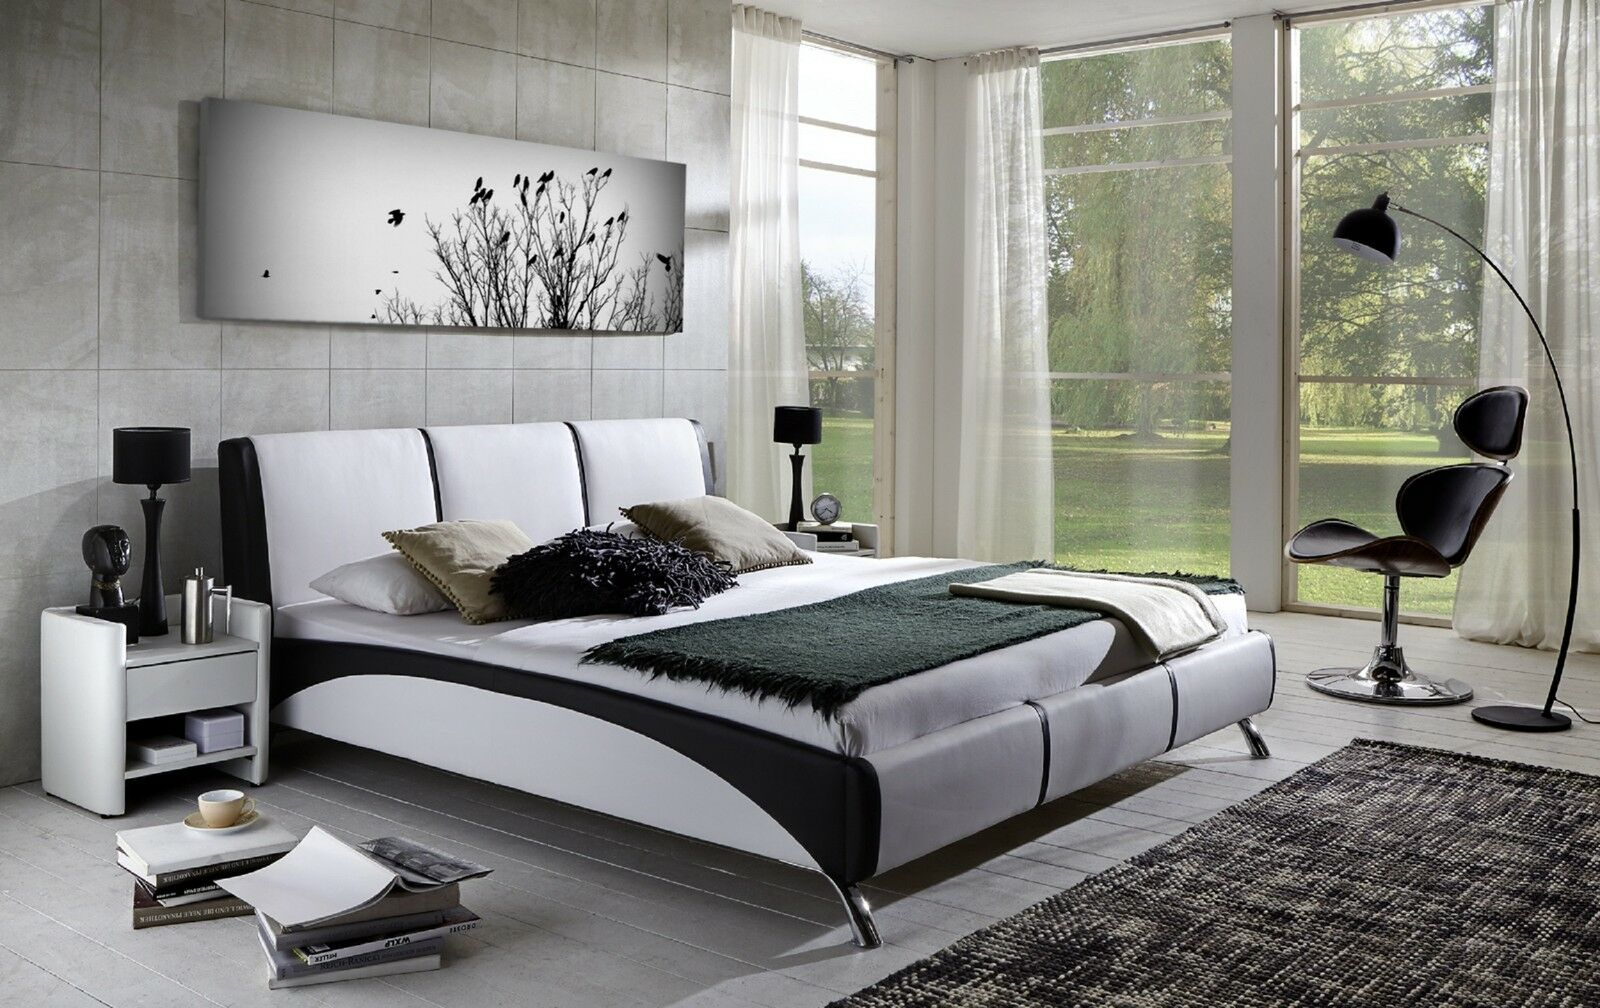 xxl panorama leinwand 155x50 natur bild baum v gel schwarz. Black Bedroom Furniture Sets. Home Design Ideas